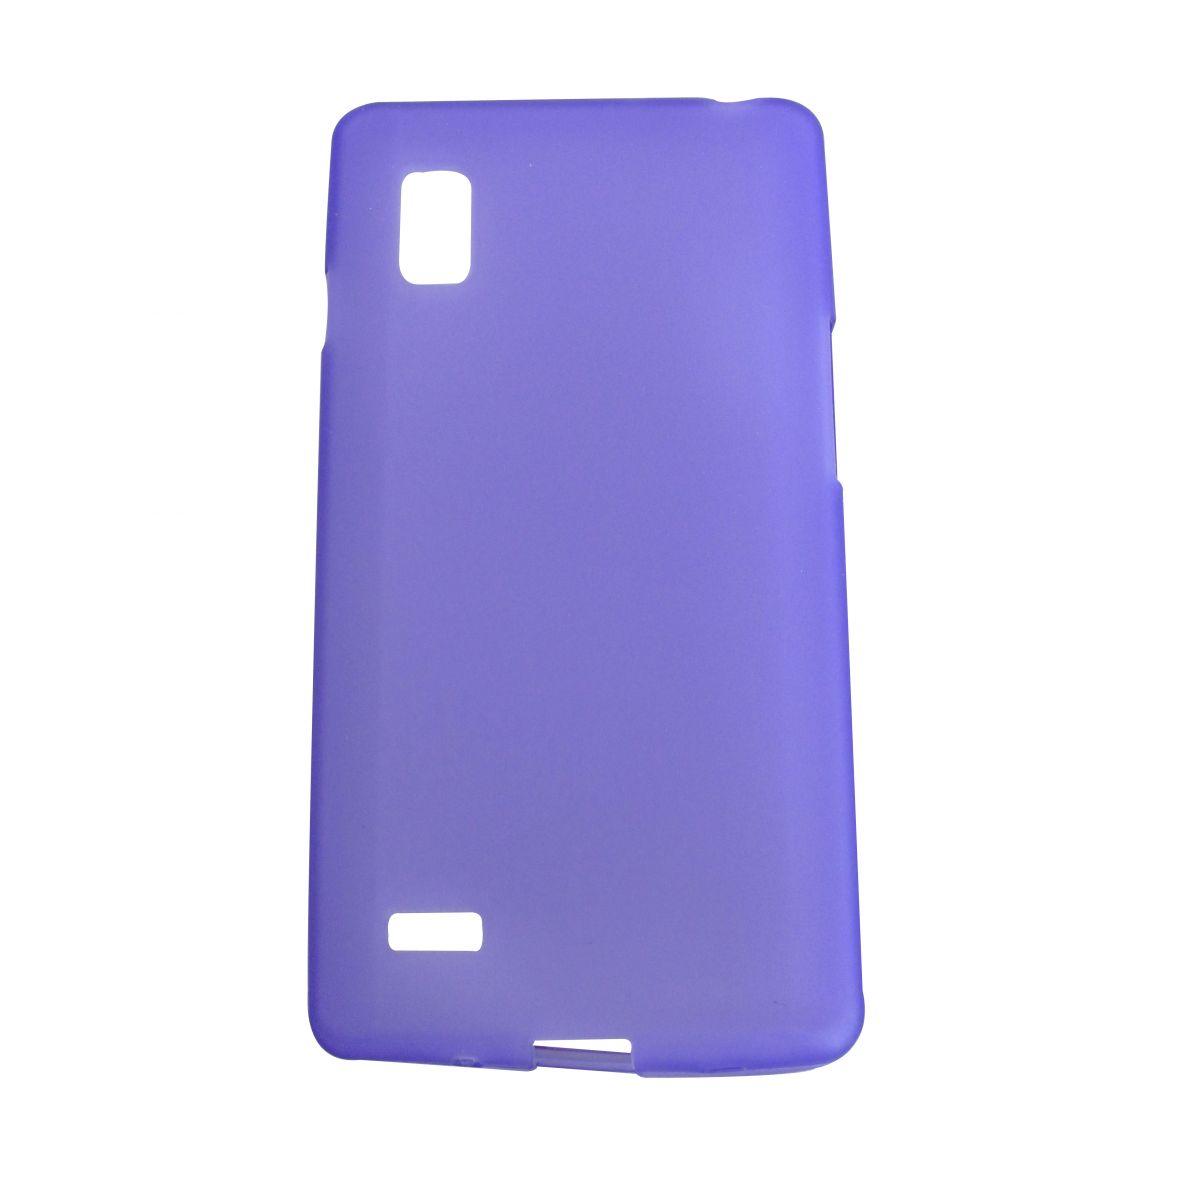 Capa TPU Roxa LG Optimus L9 P760 + Película Flexível